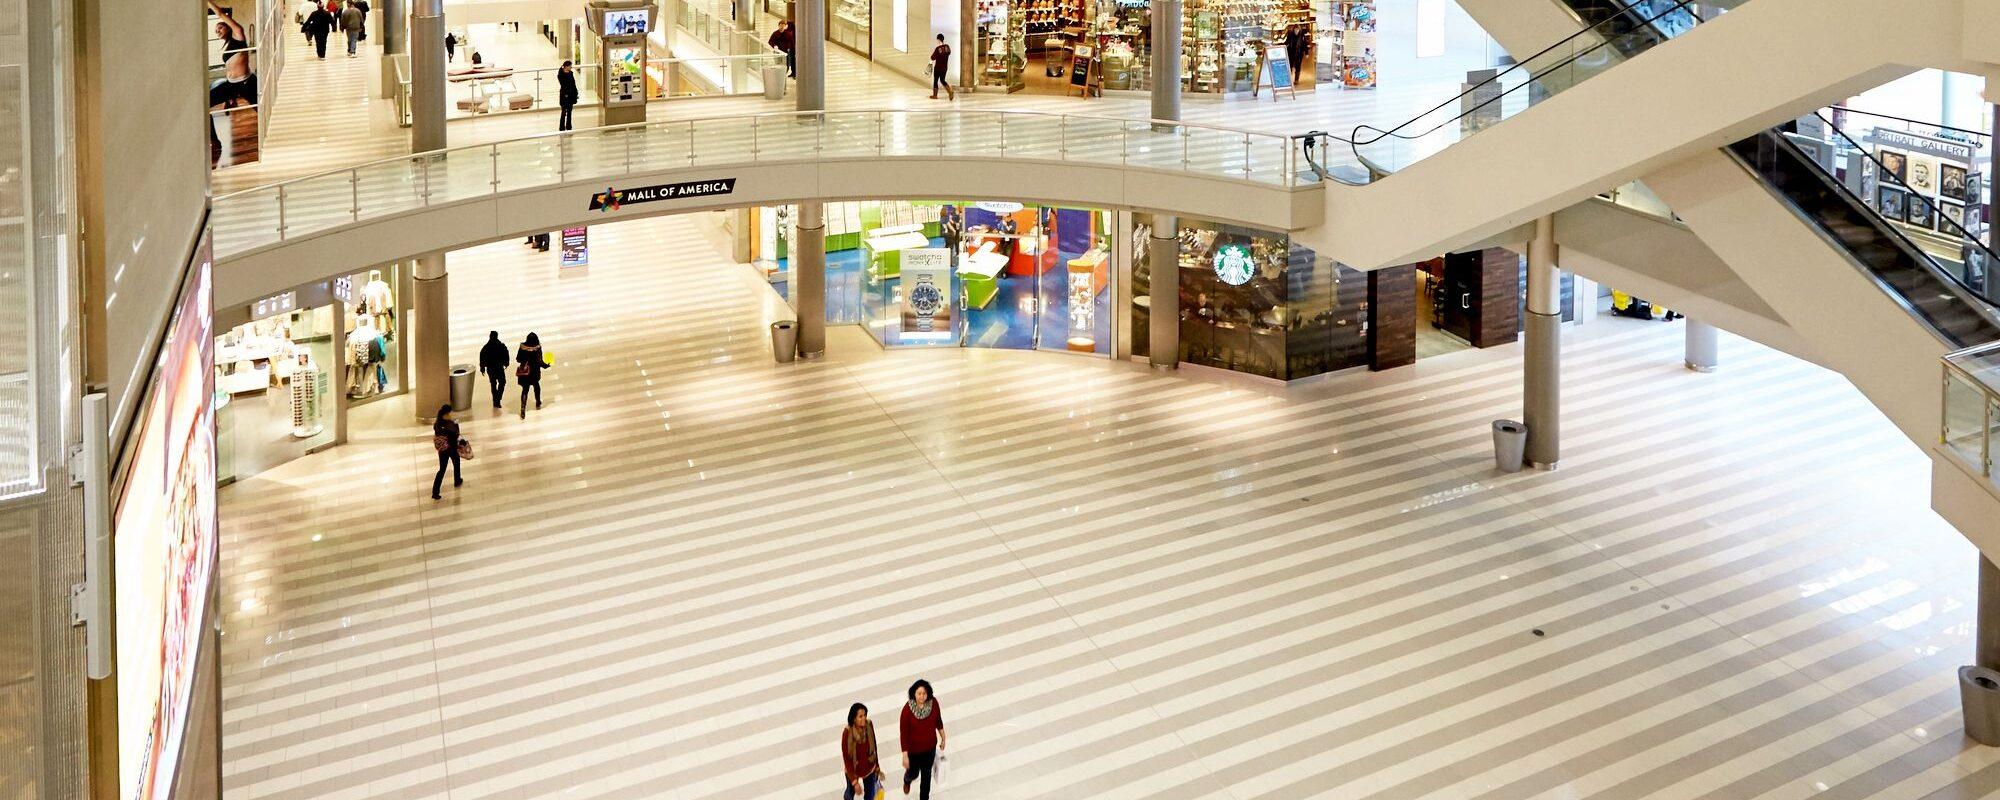 WPRD 98.3 G-COM radio Ep 3 – Movies, Religion and the Future of Retail